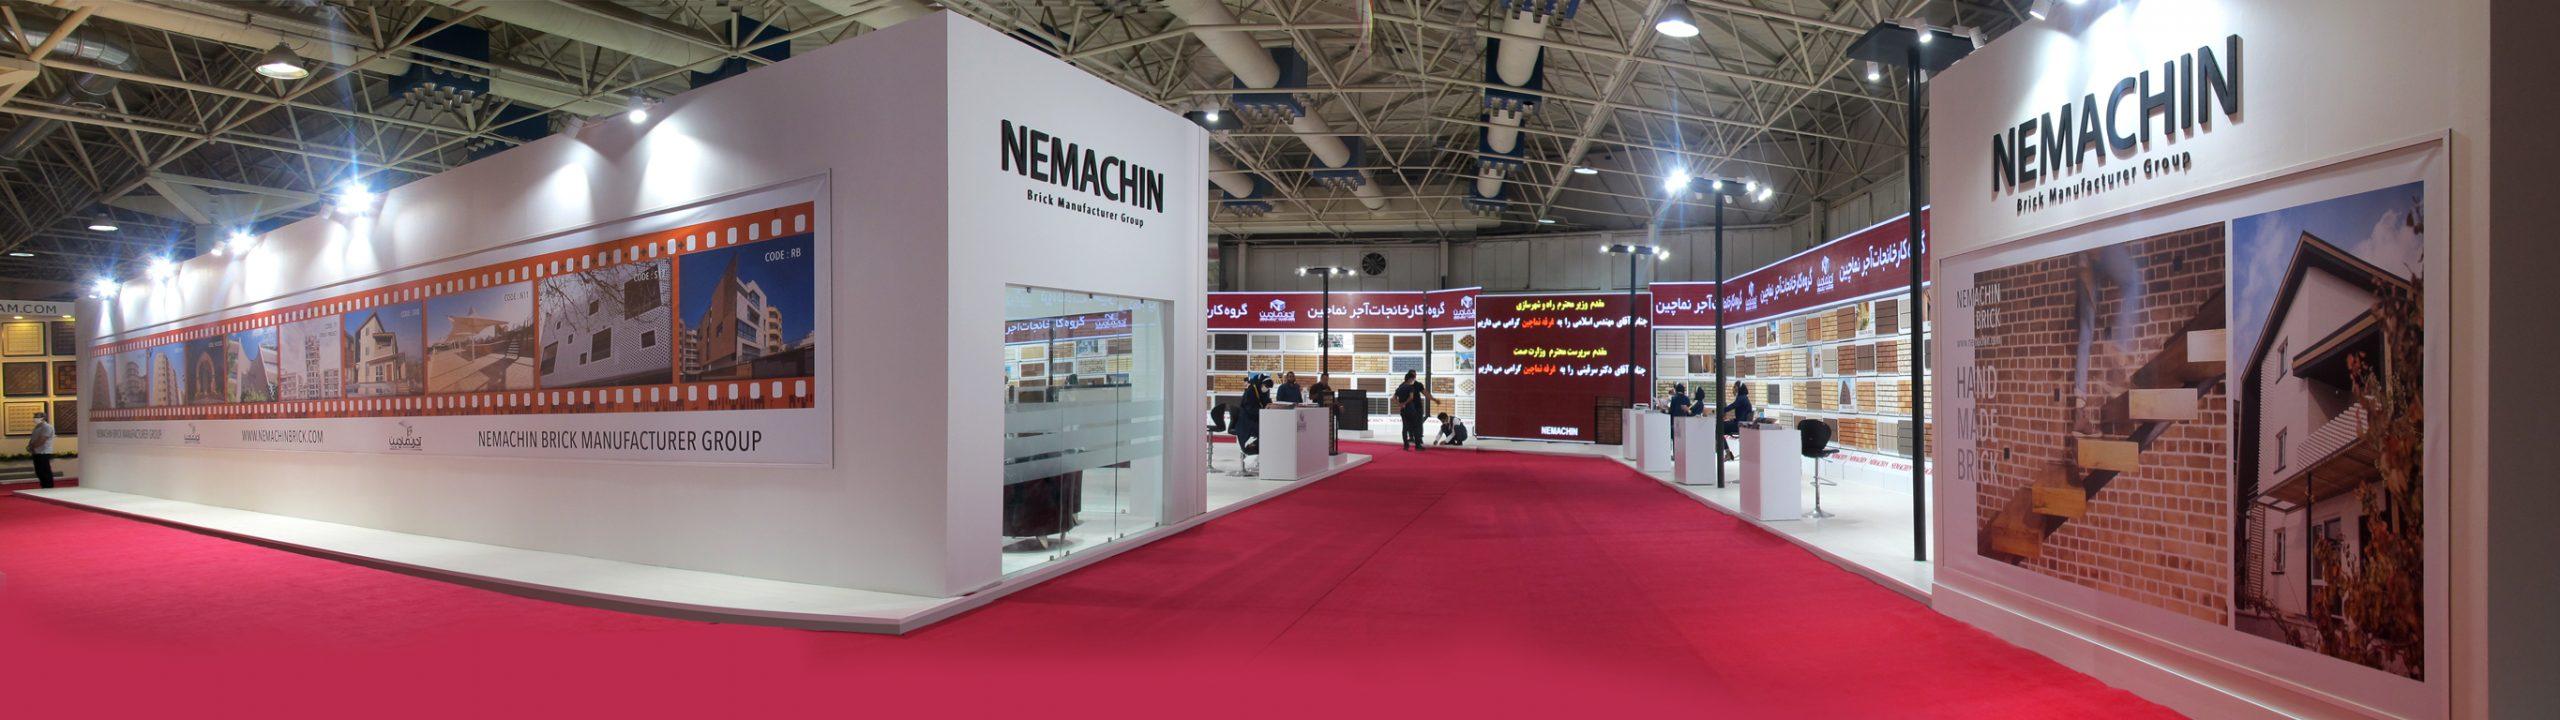 Nemachin_IranConFair2020_03